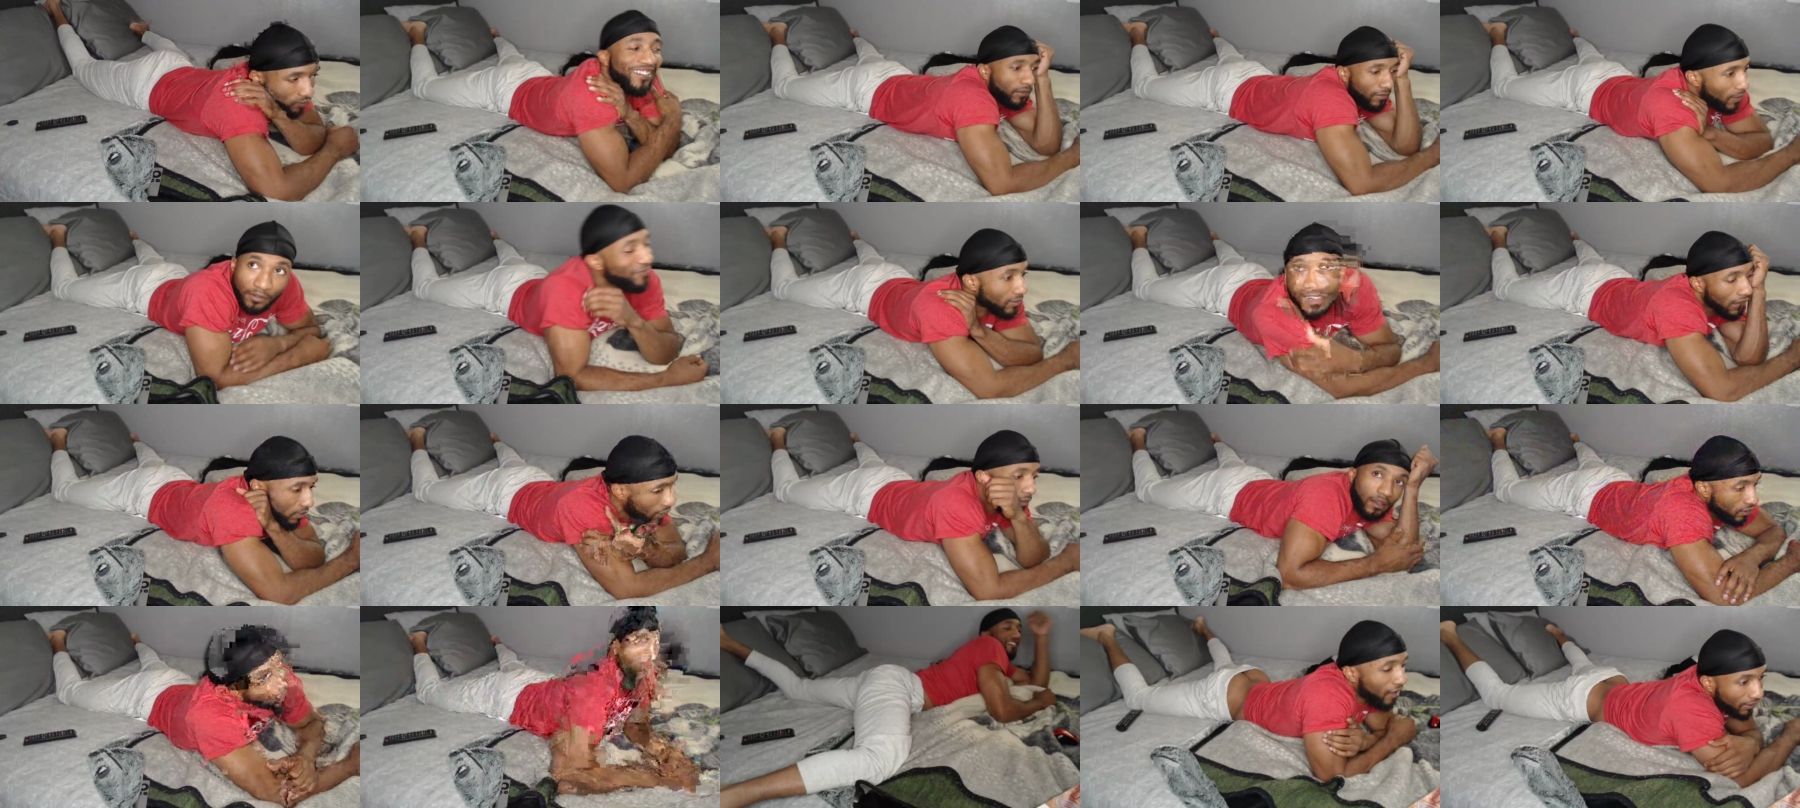 Mr_Lamar Chaturbate 22-07-2021 video kinky